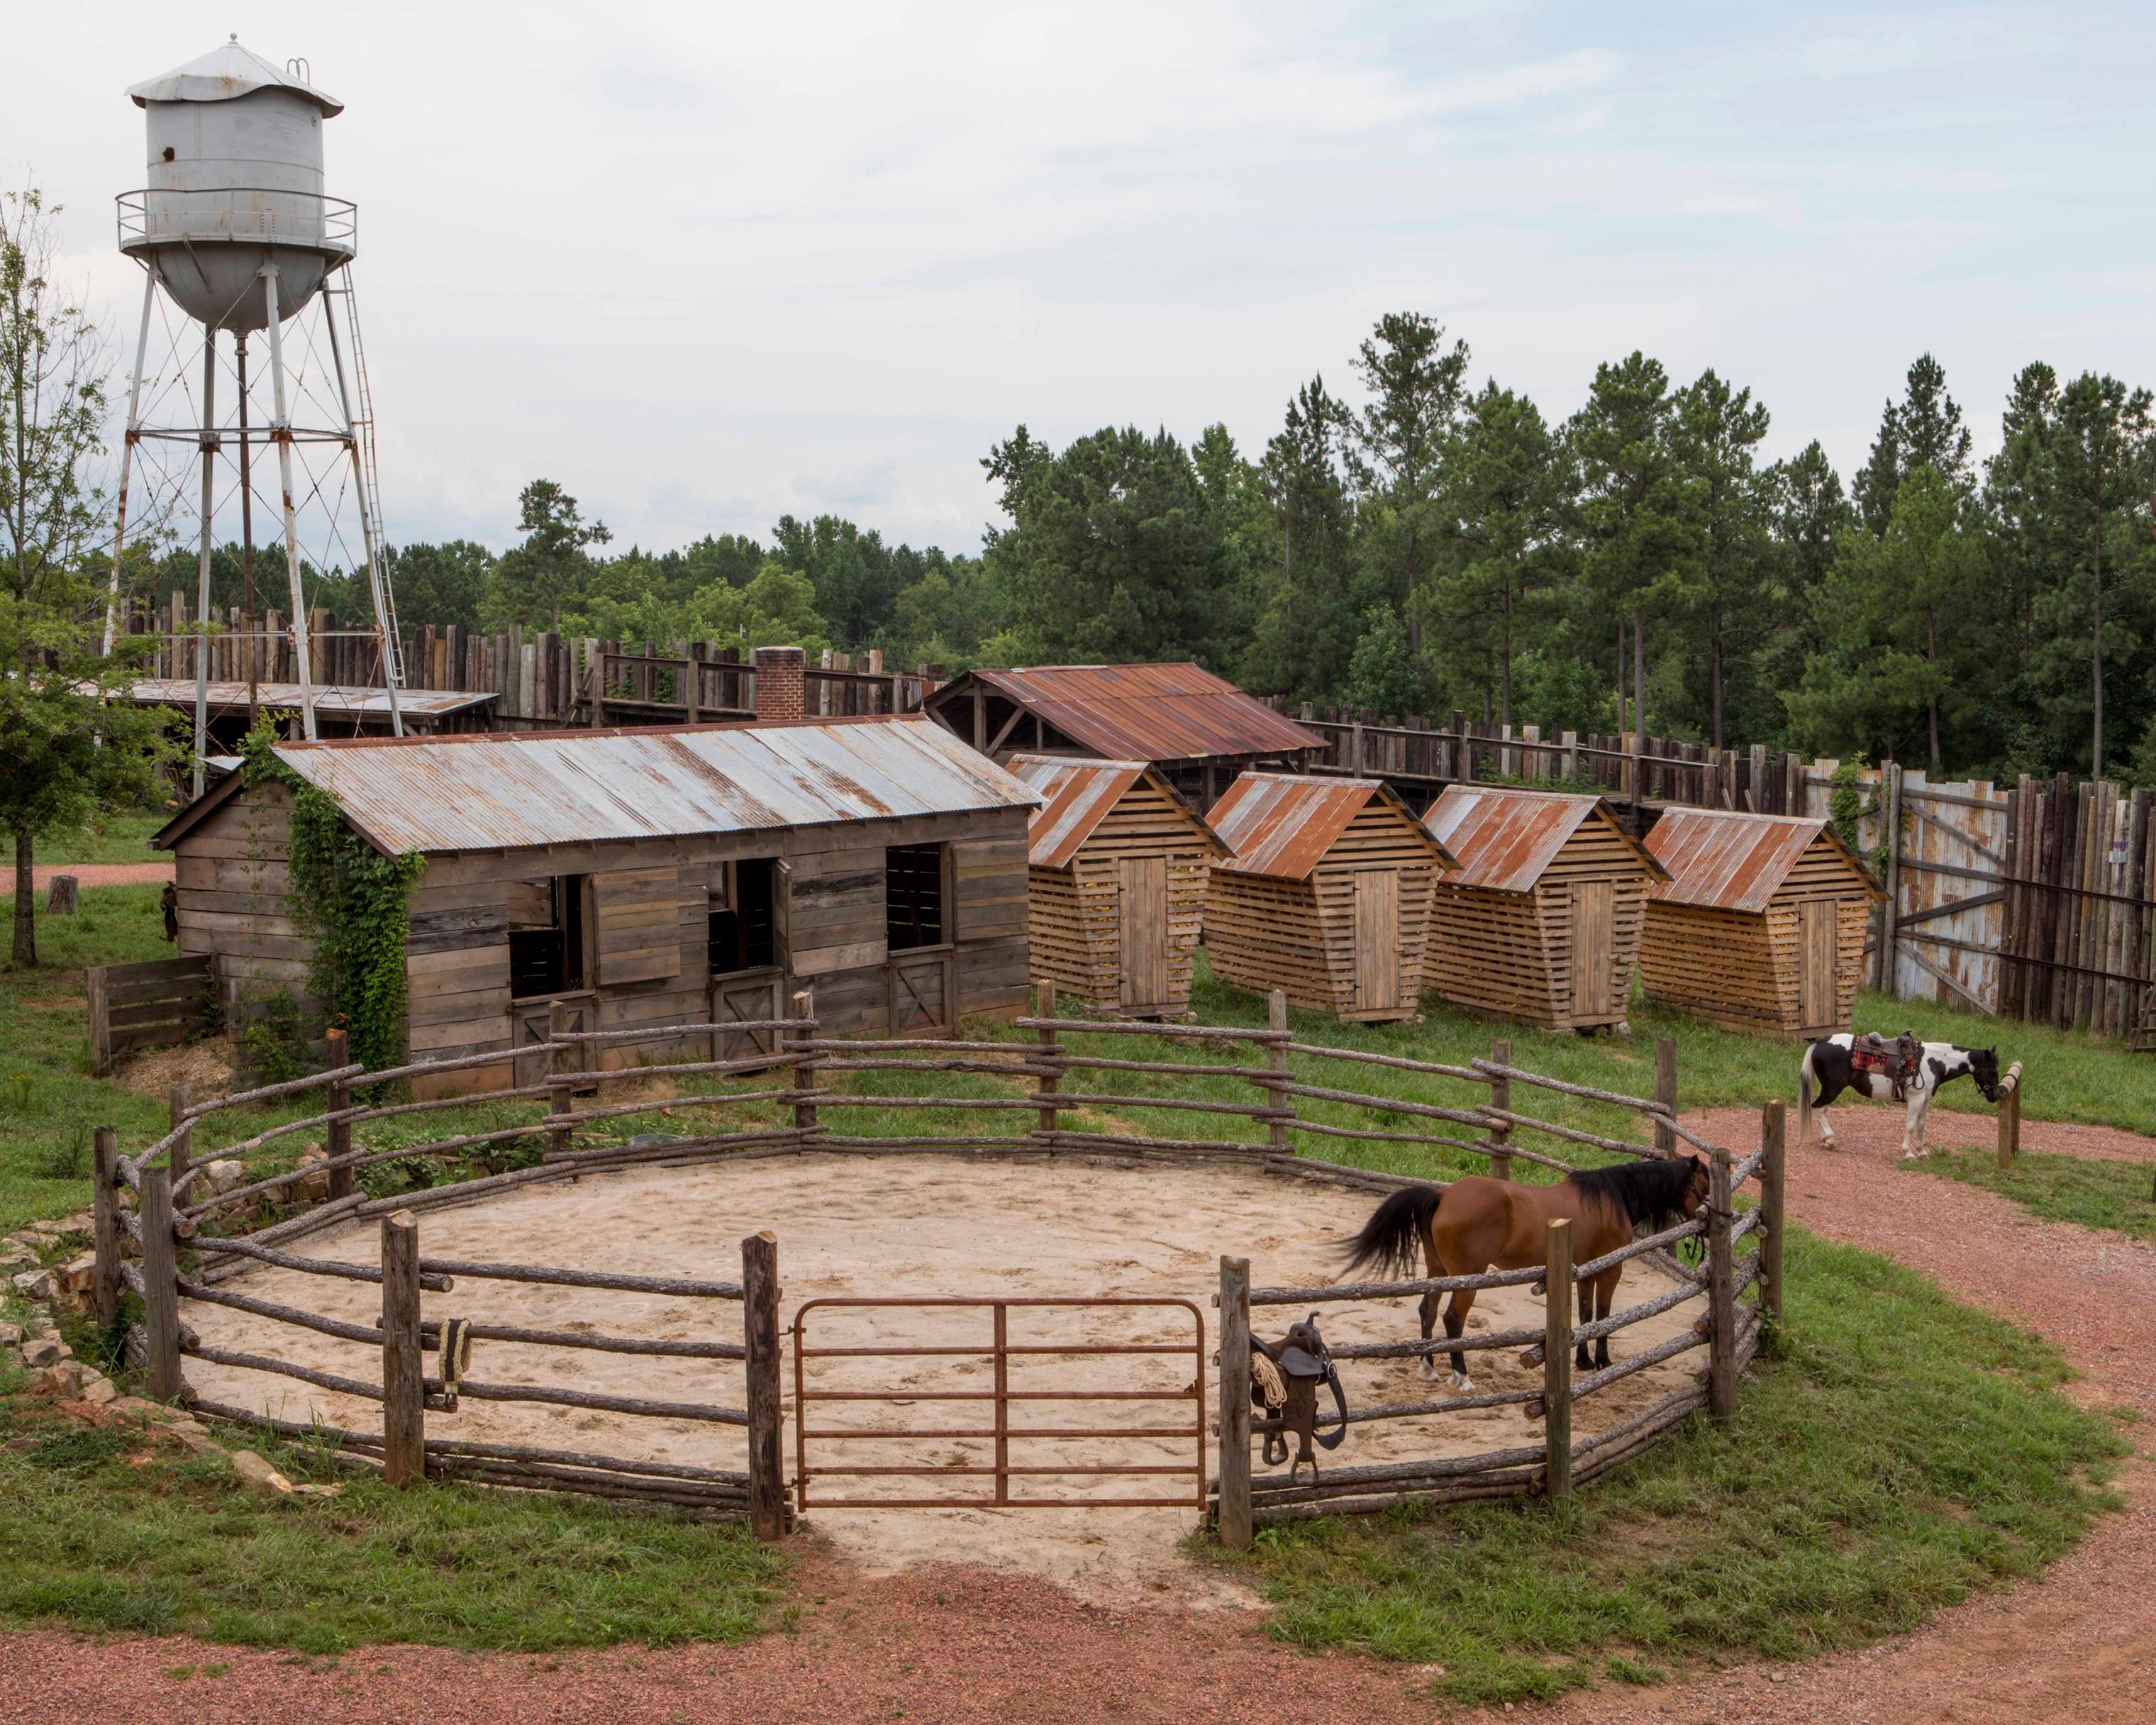 A horse corral set on season 9 of AMC's The Walking Dead filmed in in Senoia, Ga.